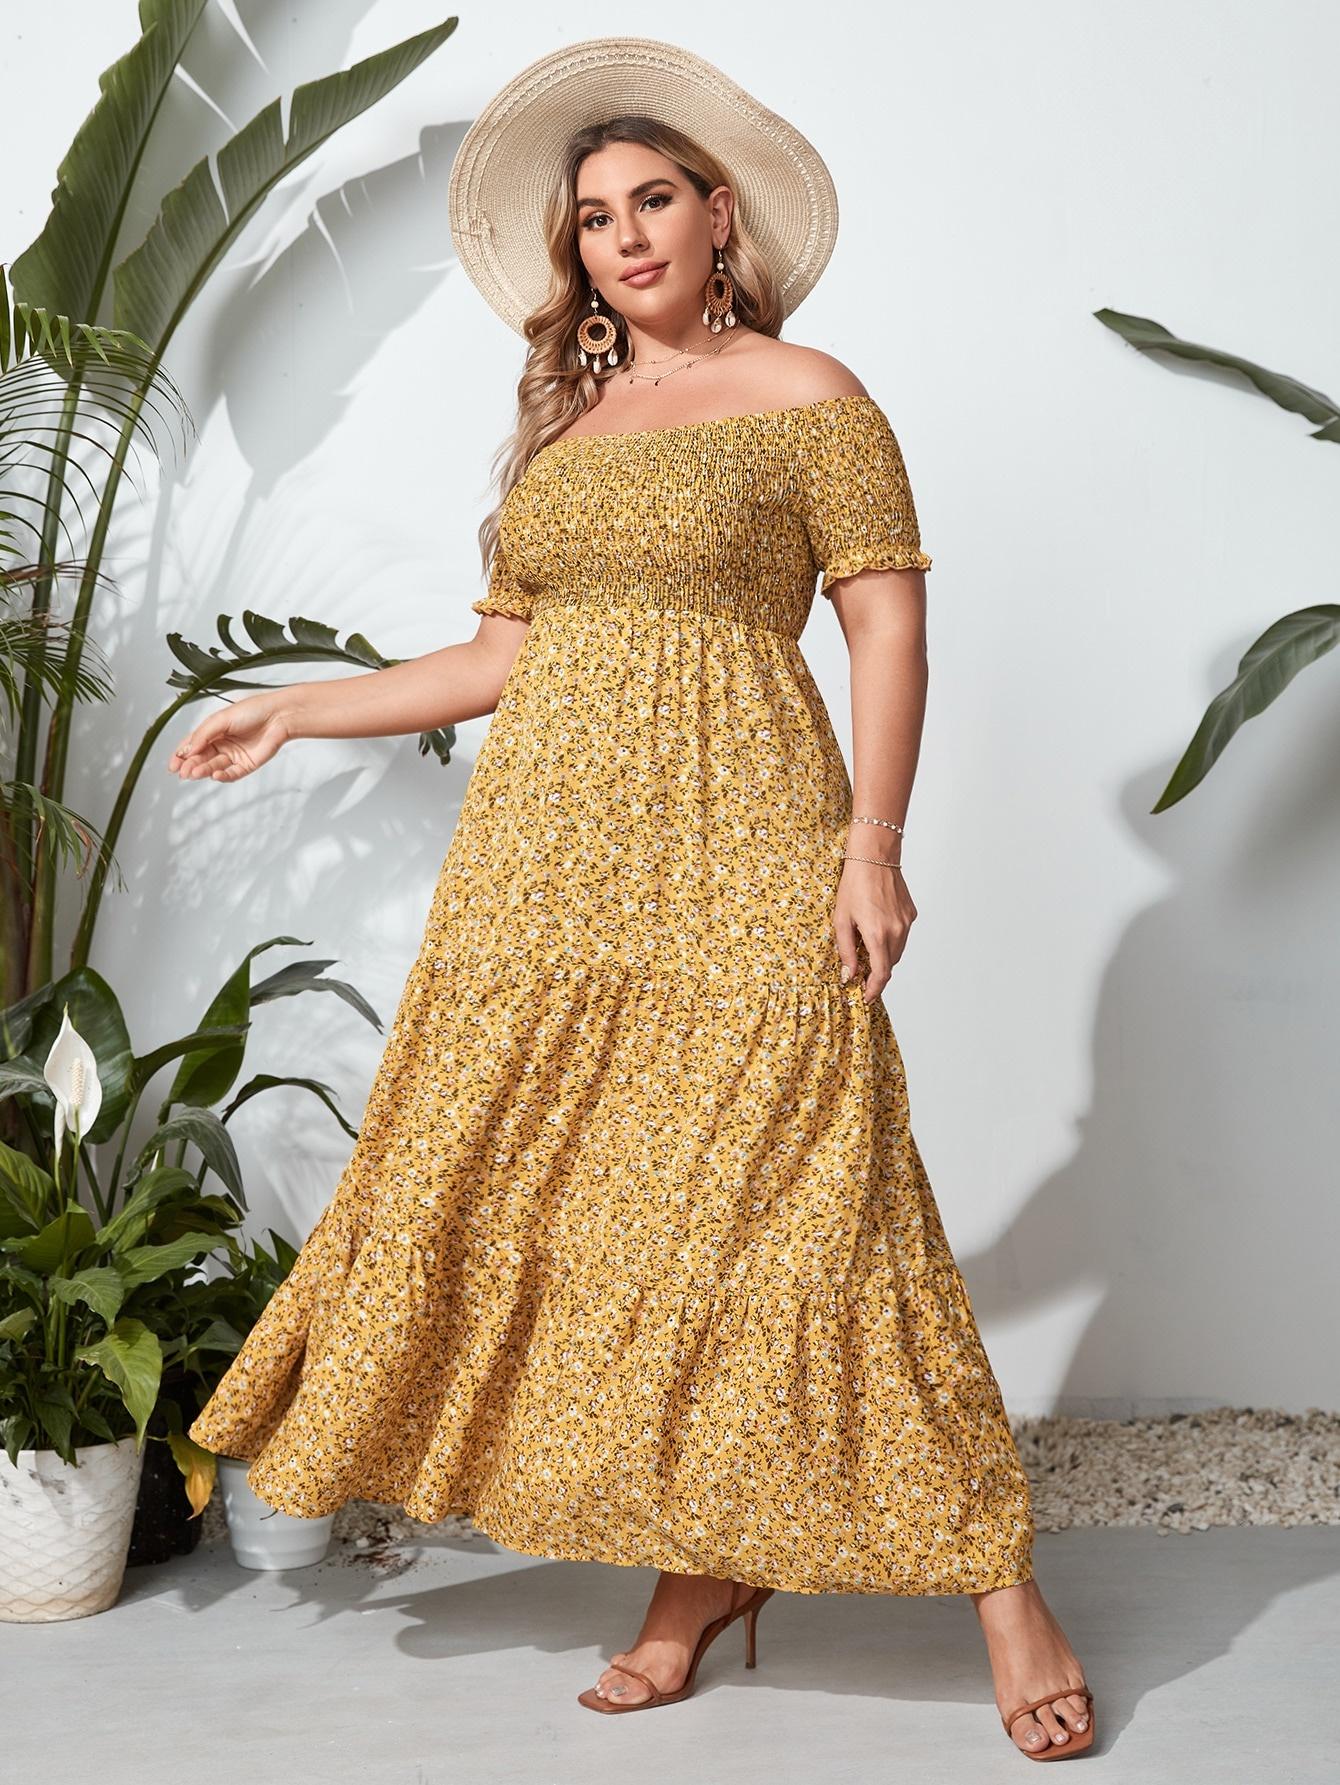 Vestidos para mujeres maduras shein